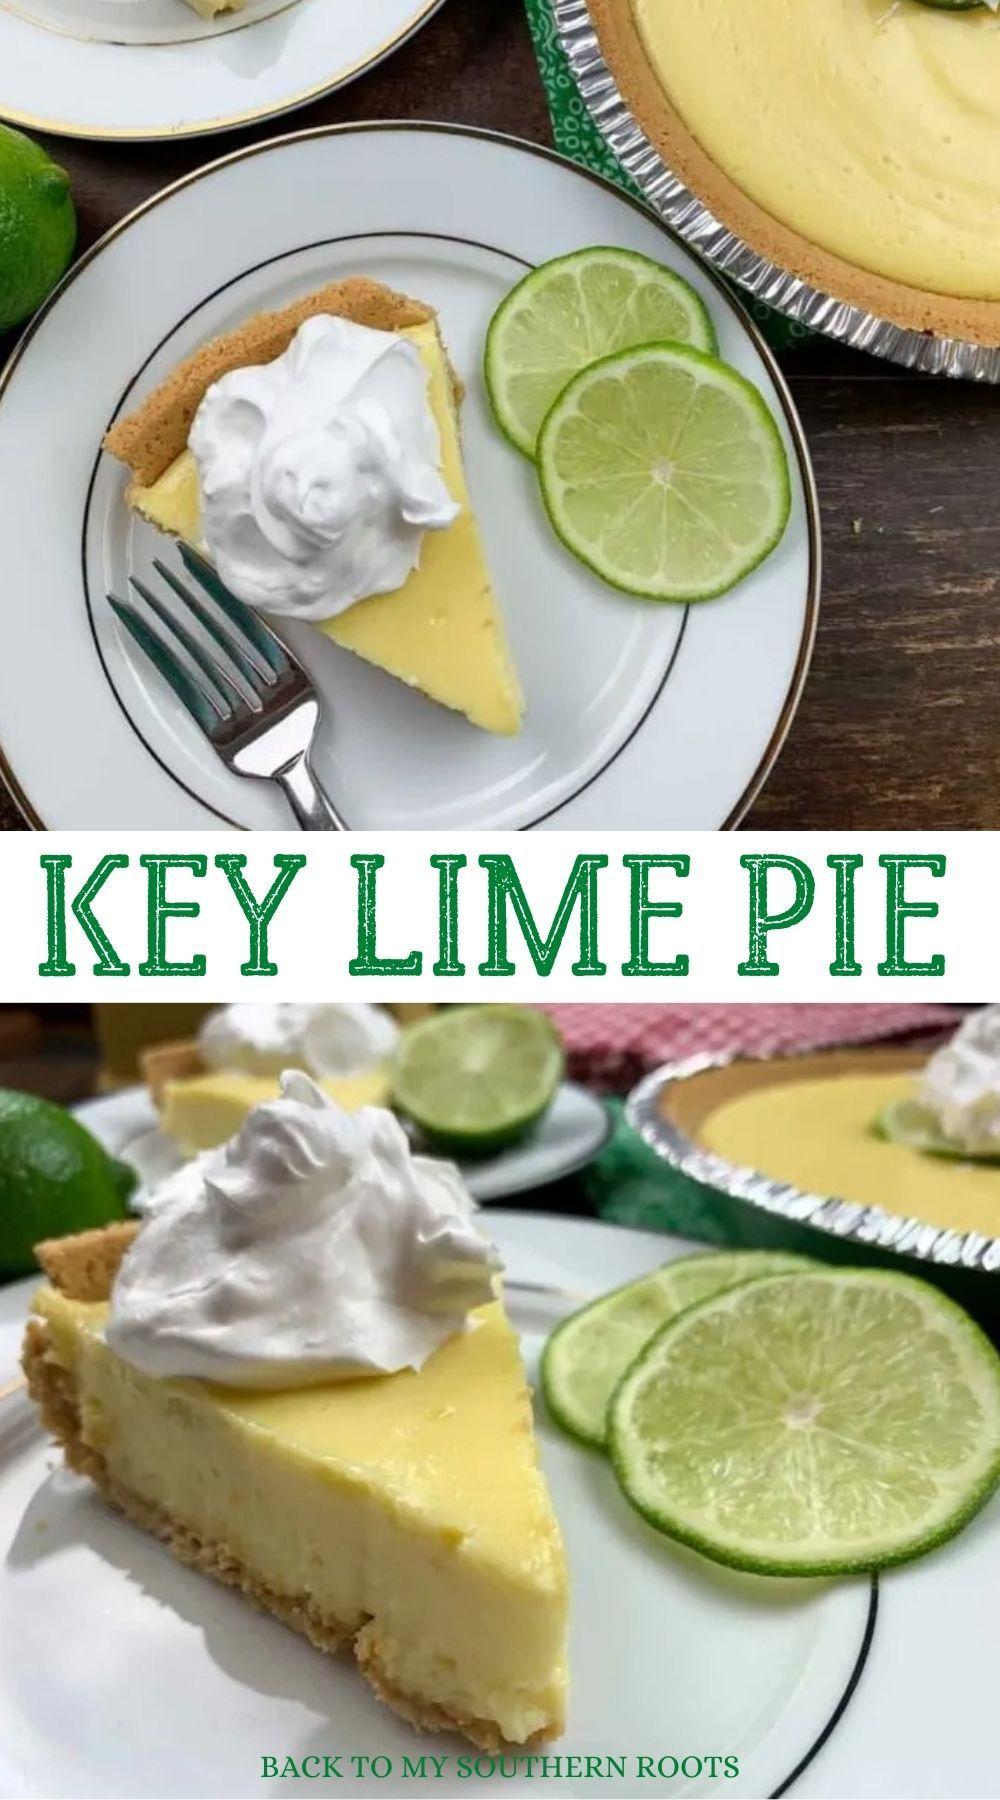 Key Lime Pie With Sweetened Condensed Milk Recipe Recipe In 2020 Milk Recipes Key Lime Pie Condensed Milk Recipes